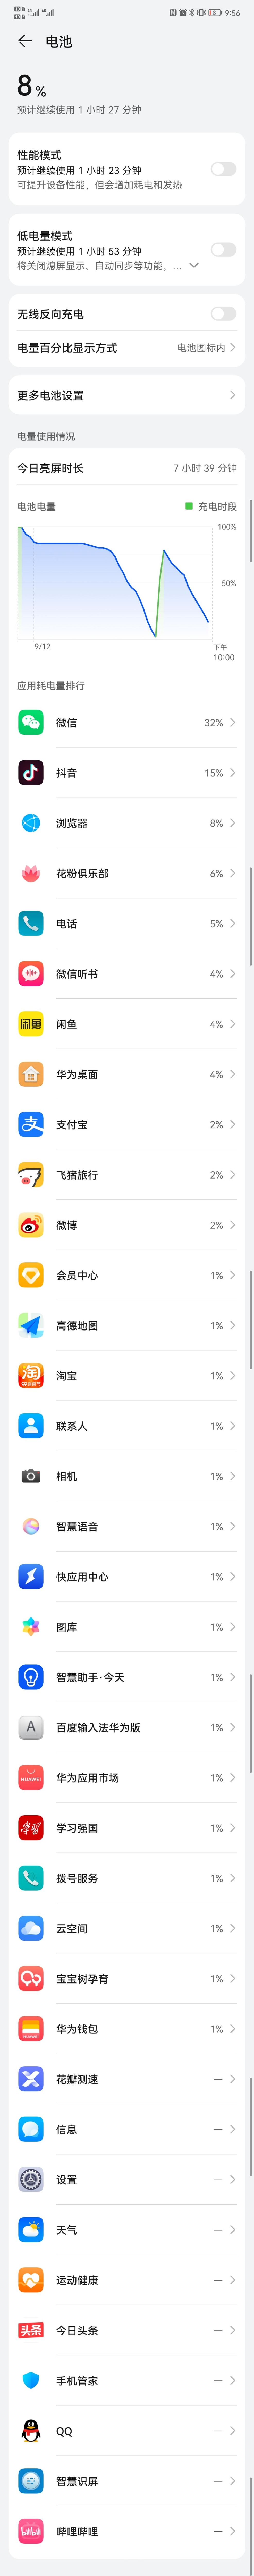 Screenshot_20210912_215620_com.huawei.systemmanager.jpg